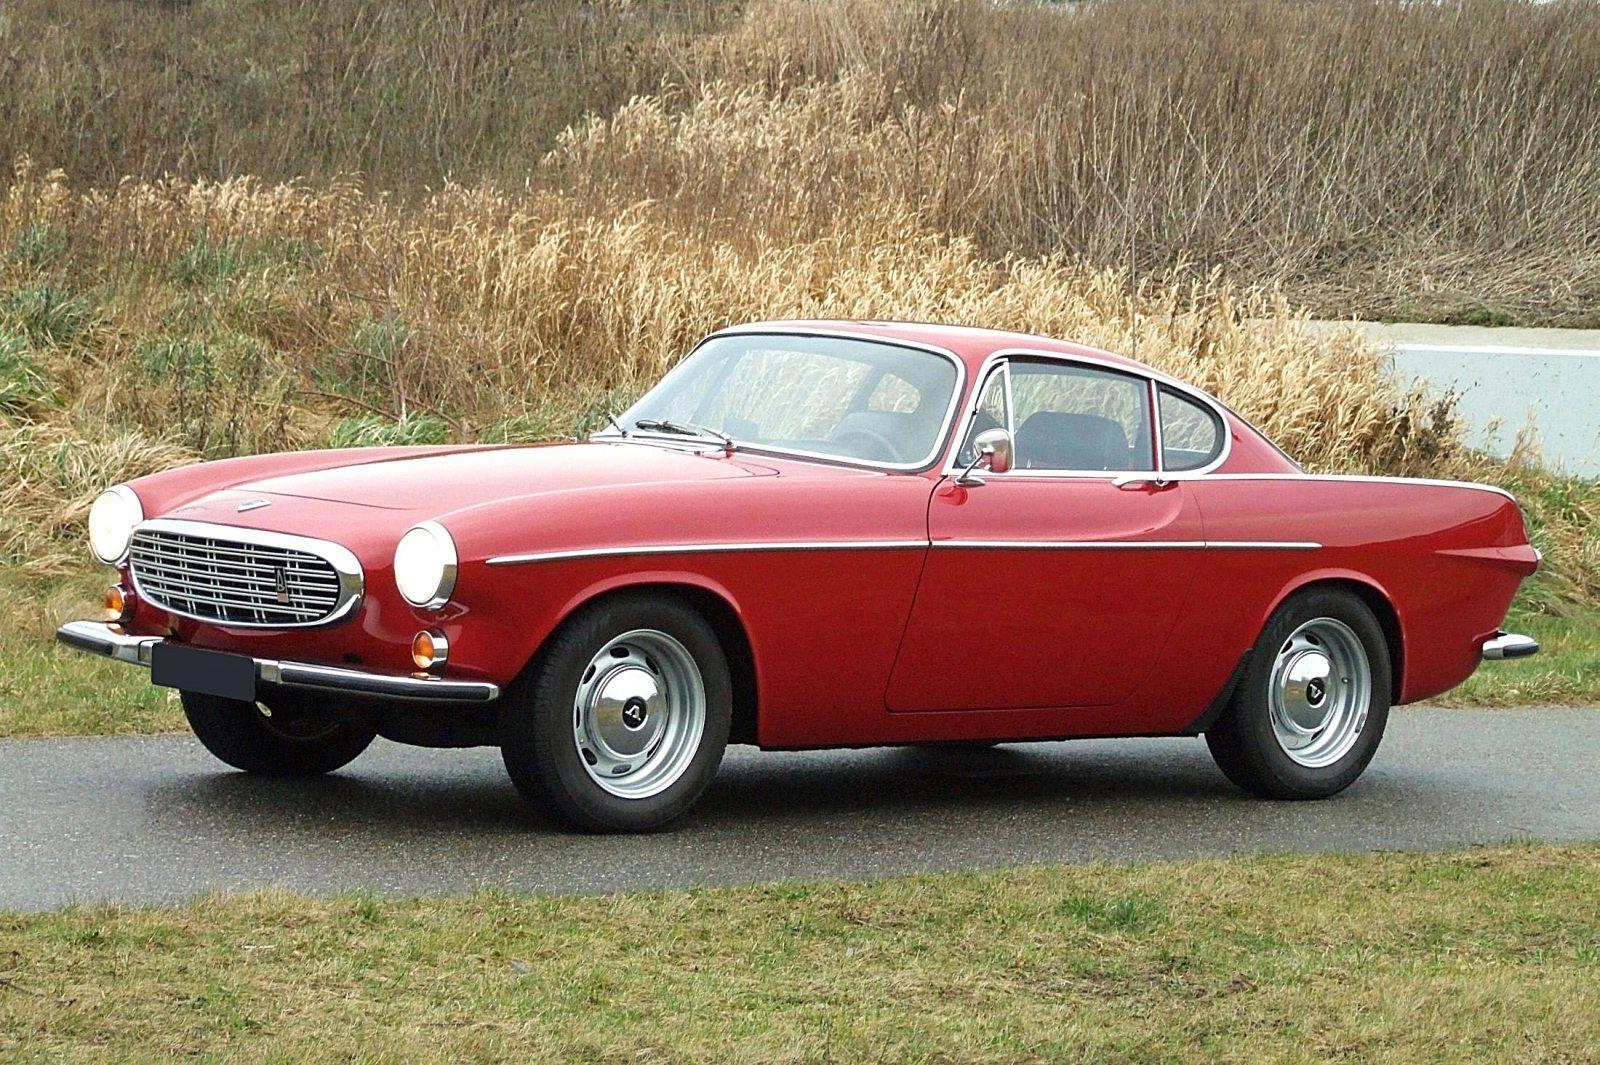 Volvo P1800 S, 1969 | P1800 - On My Wish List | Pinterest | Volvo ...